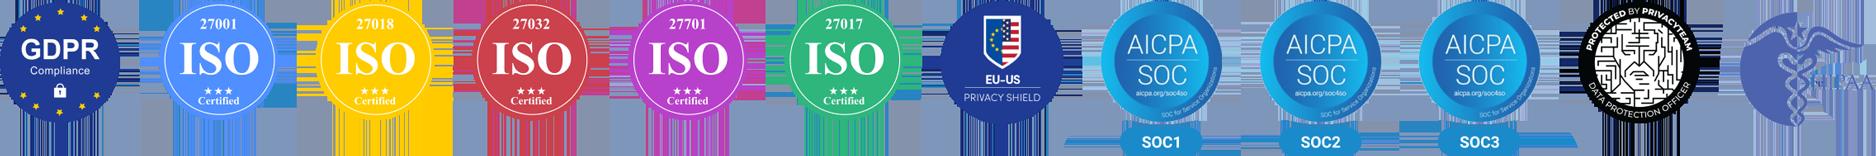 Seguridad de nivel empresarial de monday.com